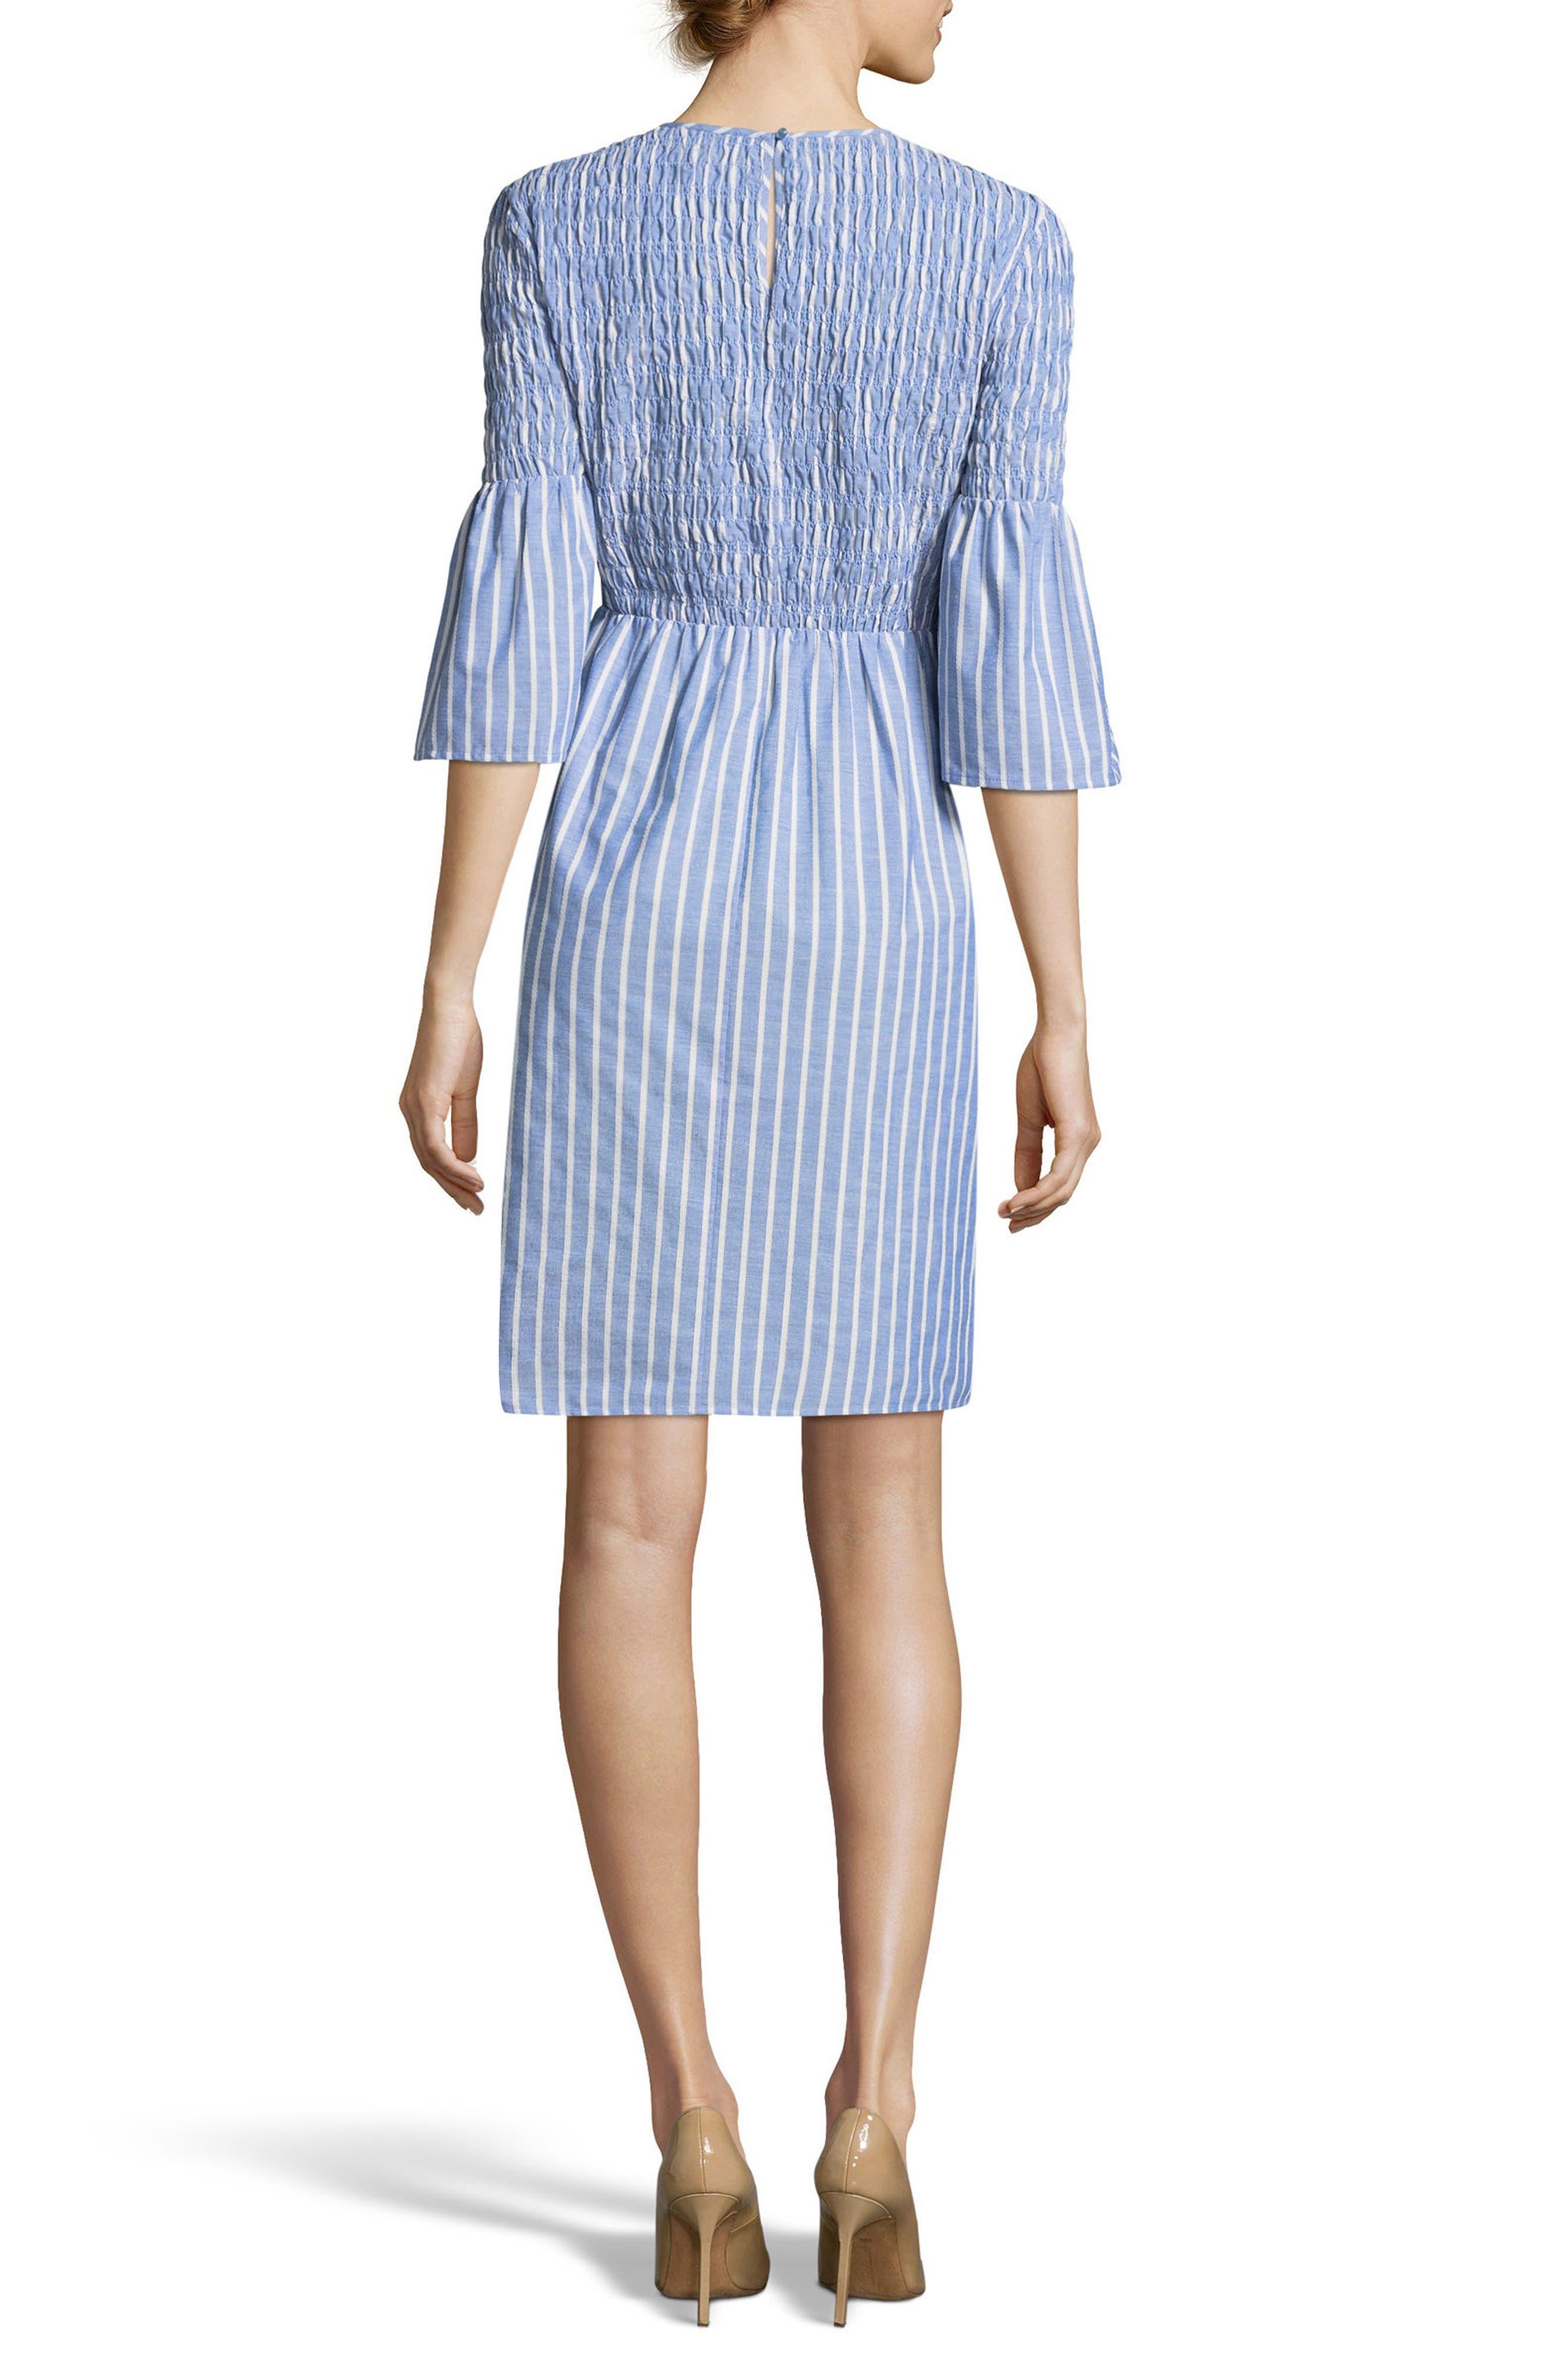 Smocked Fit & Flare Dress,                             Alternate thumbnail 2, color,                             Blue/ Ivory